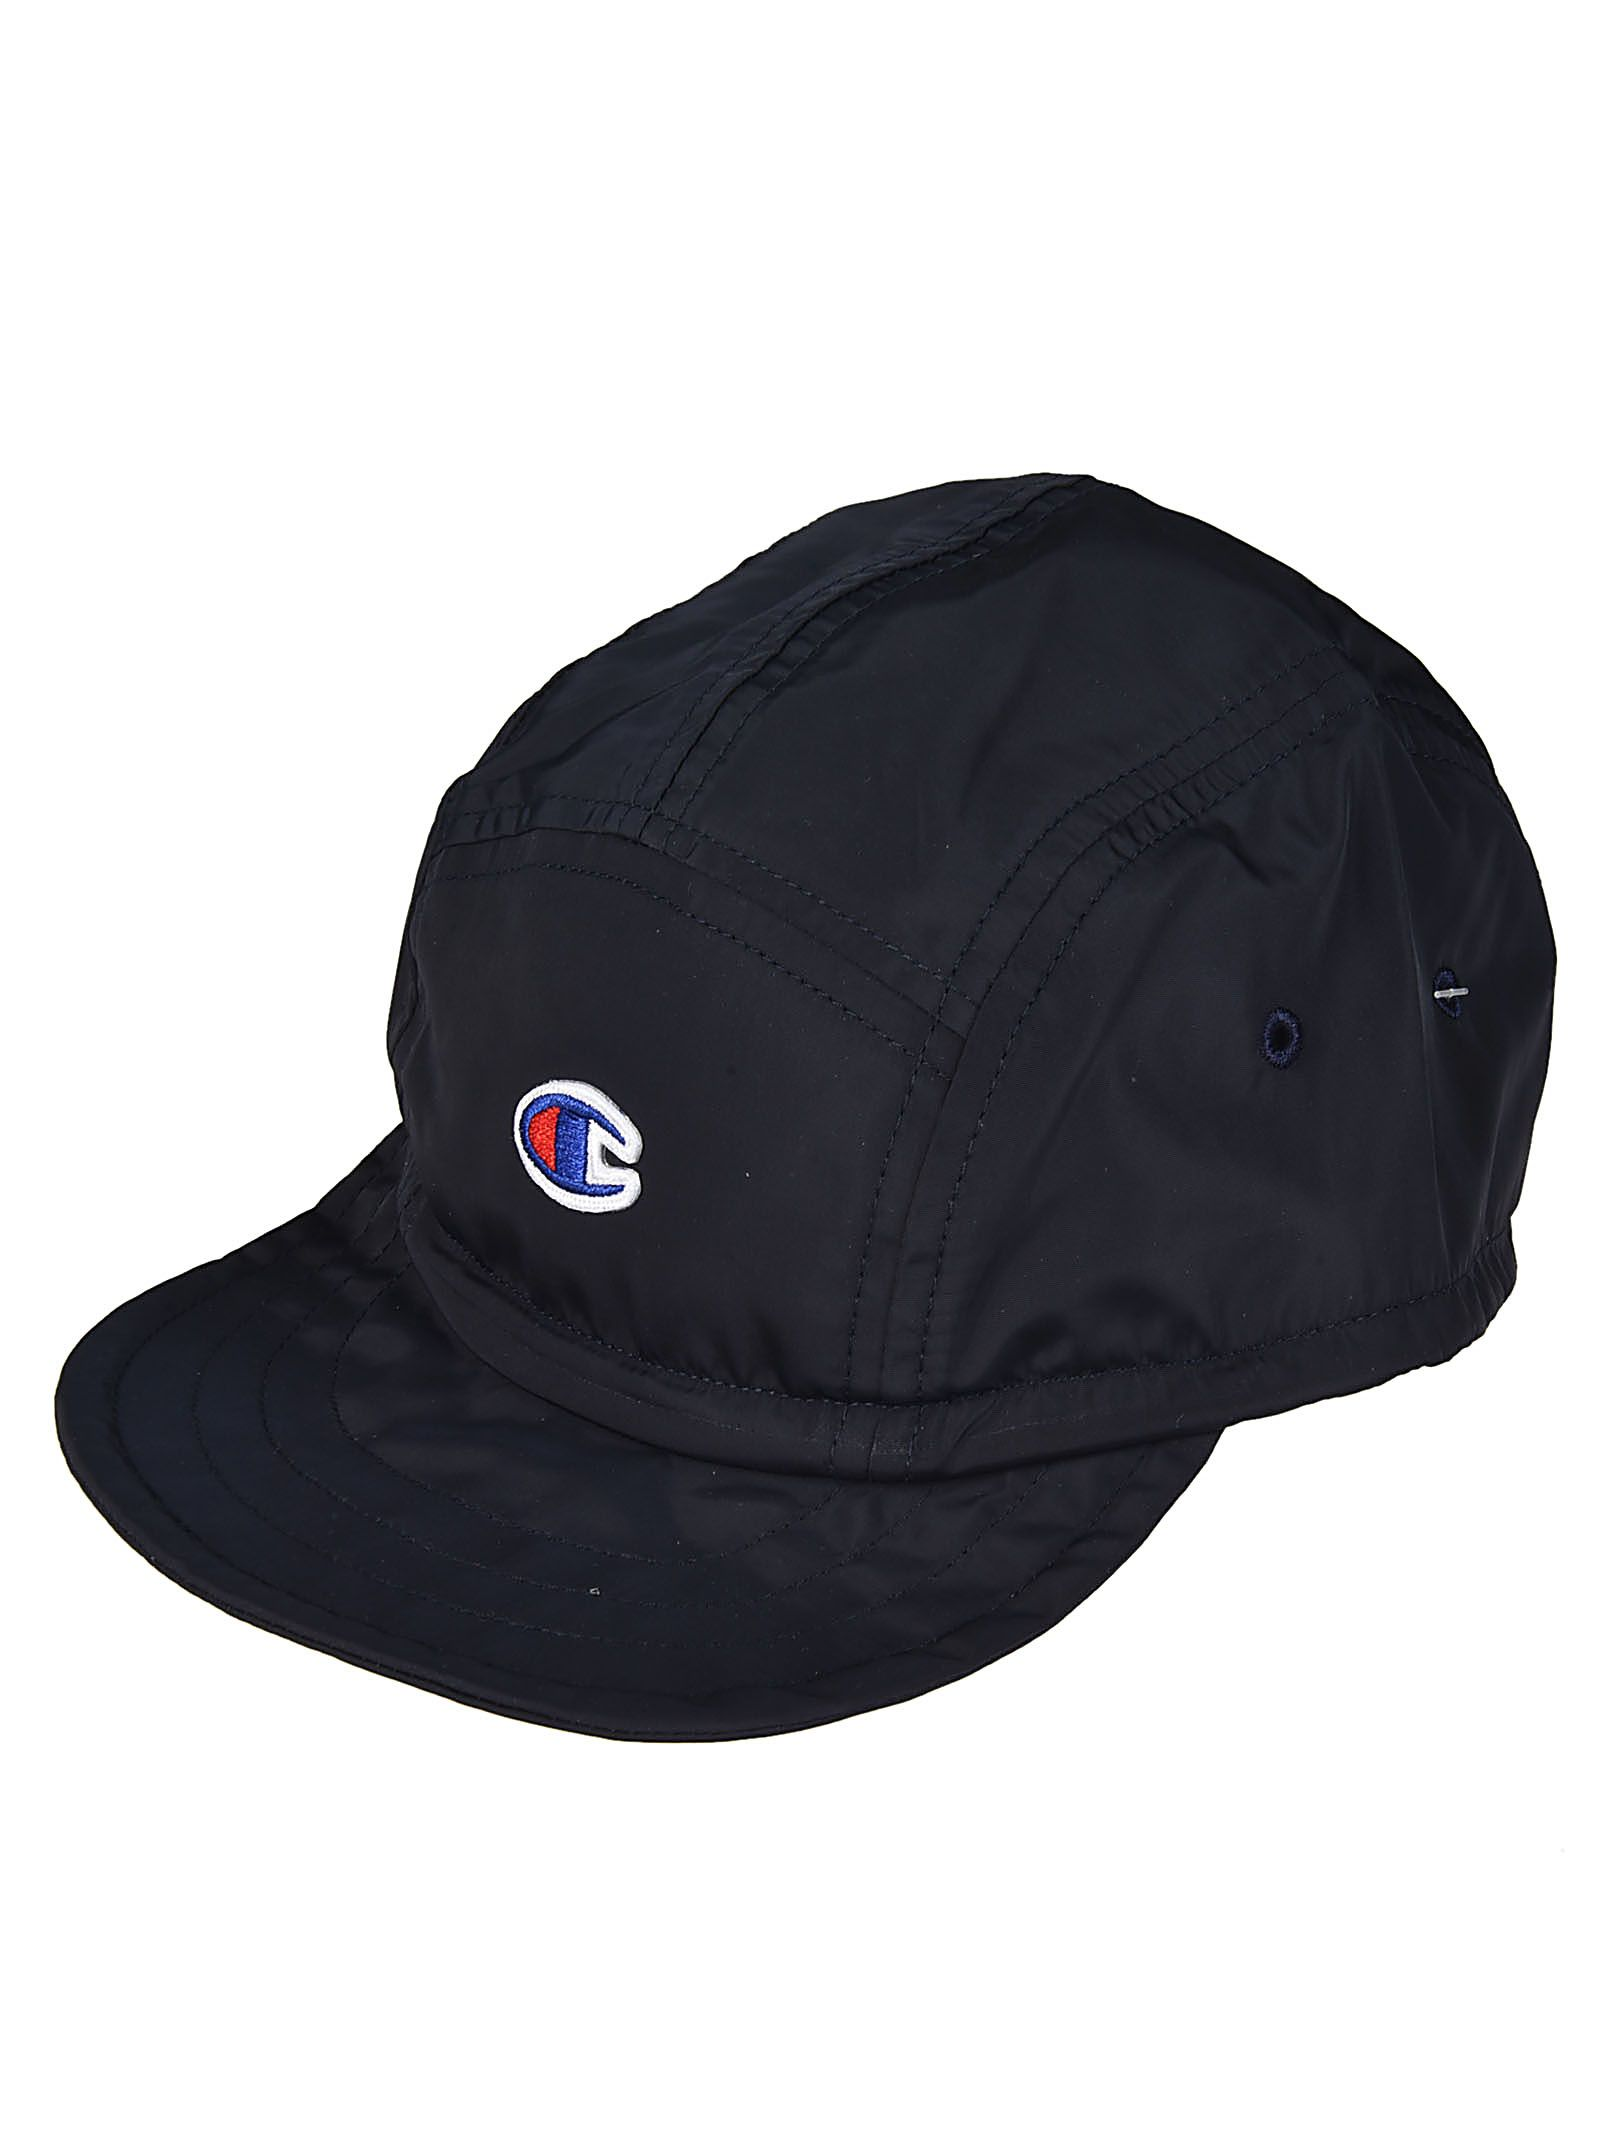 4b84b34bf13 Champion X Beams Packable Cap